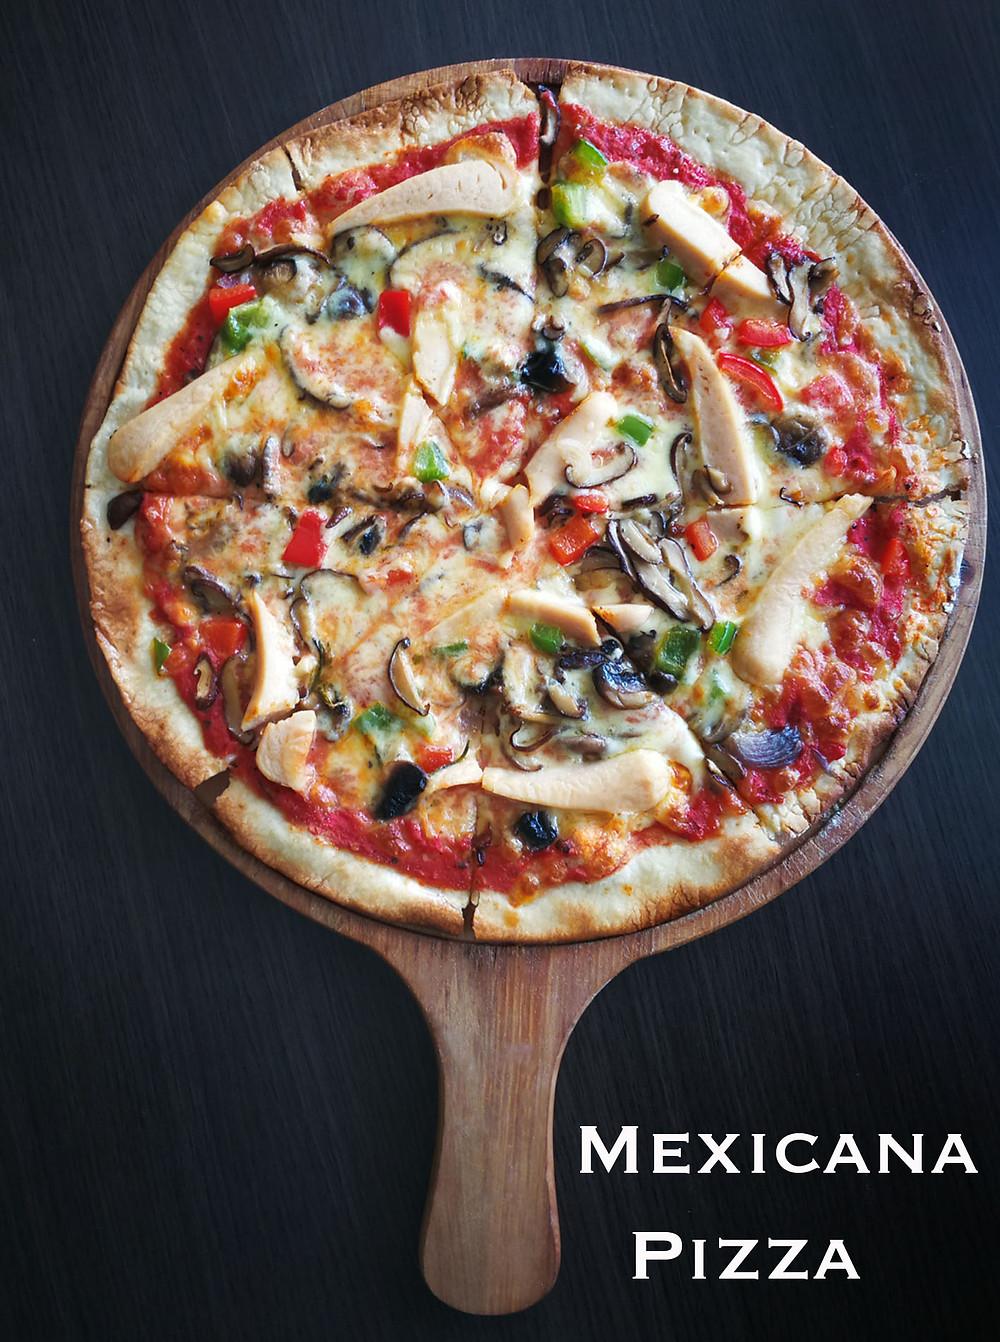 serembanonline photograph of Mexicana Pizza at MoVida, d'Tempat Country Club at Sendayan by photographer Nic Falconer nicaliss